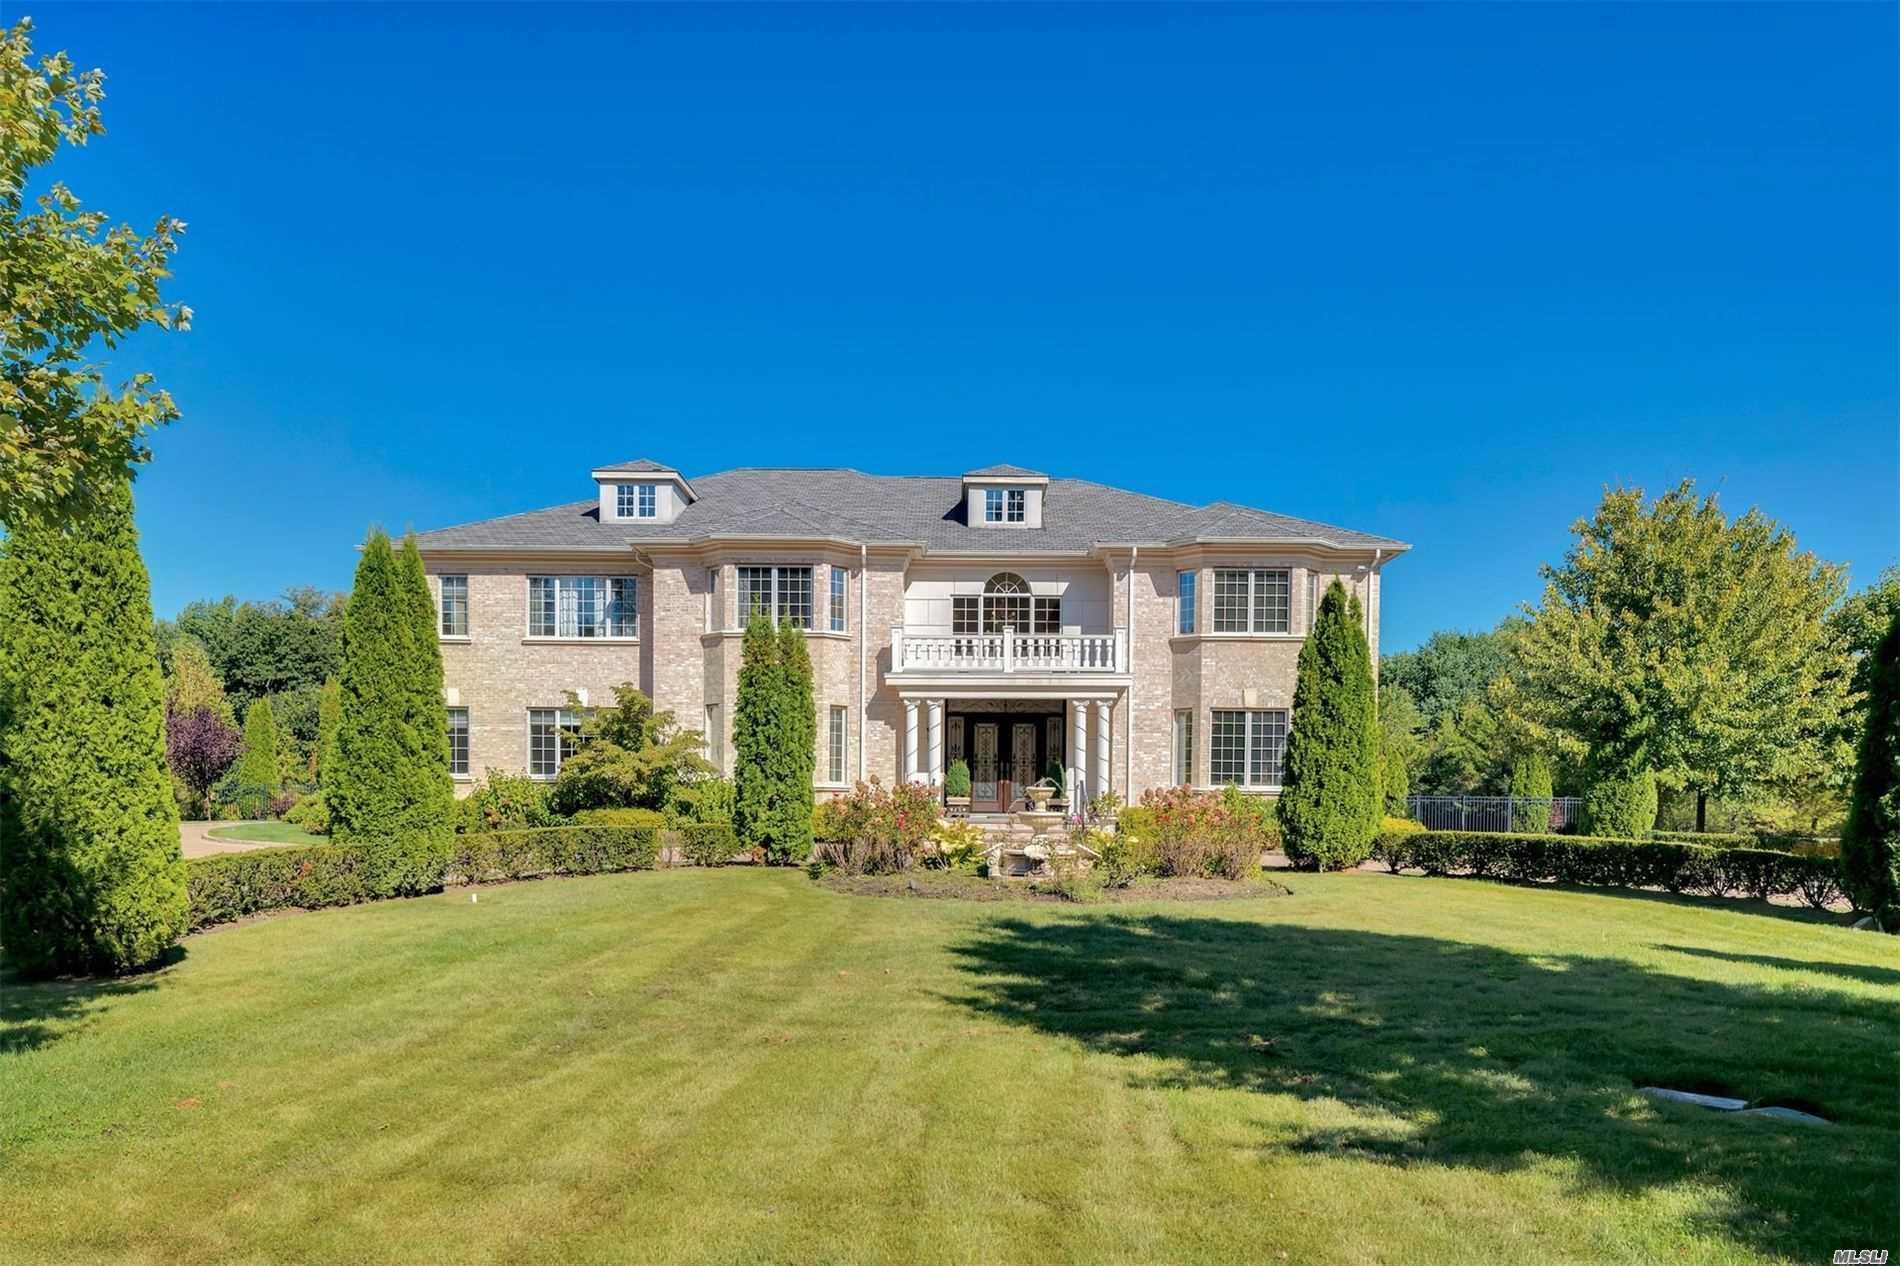 20 Cedar Brook Court, Old Brookville, New York 11545, 6 Bedrooms Bedrooms, ,5 BathroomsBathrooms,Residential,For Sale,Cedar Brook,3168320